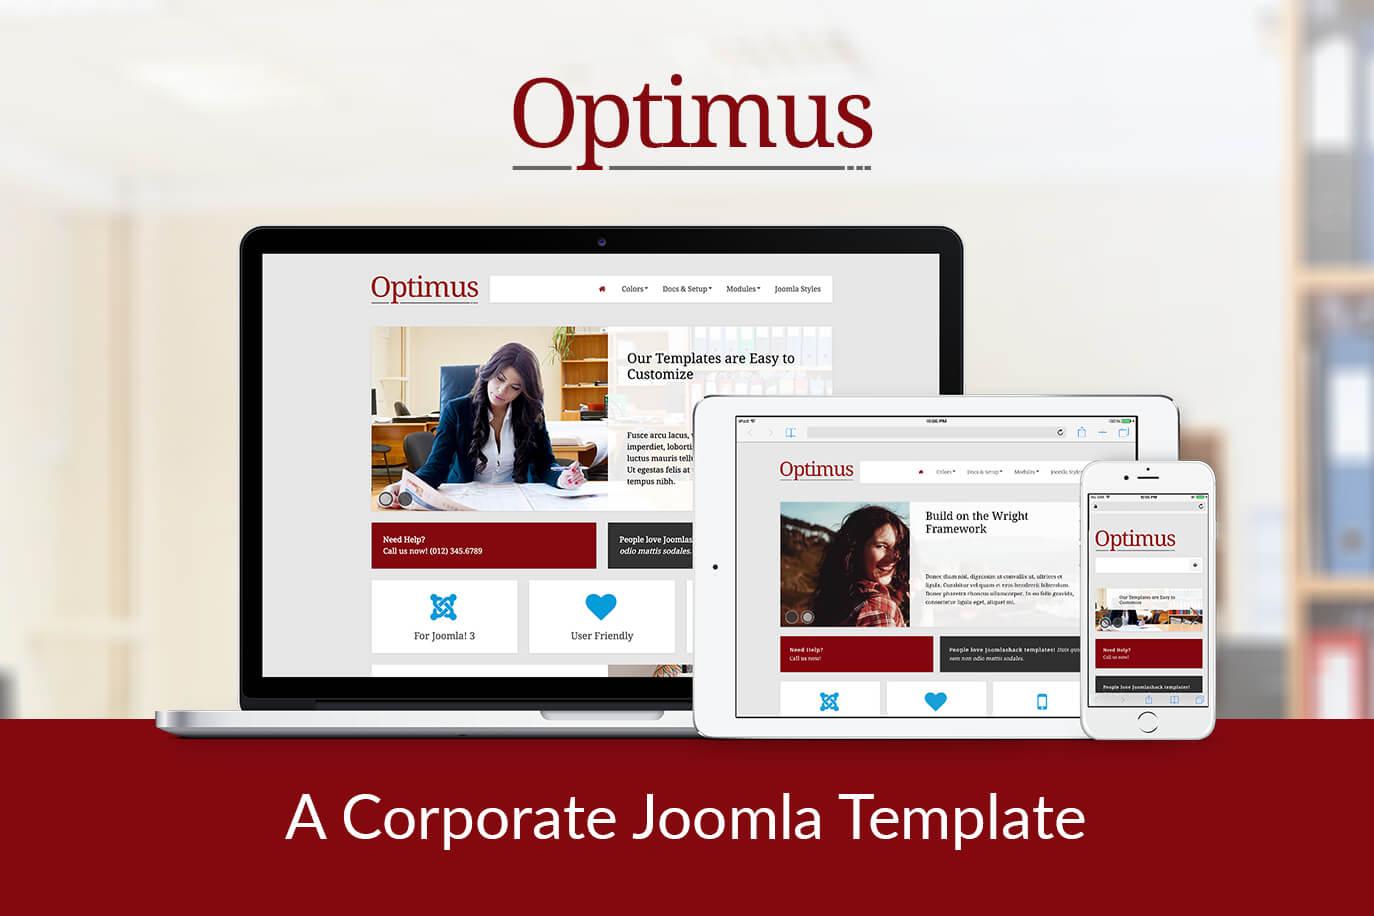 Joomla Templates - Responsive, Fast Joomla Designs - Joomlashack